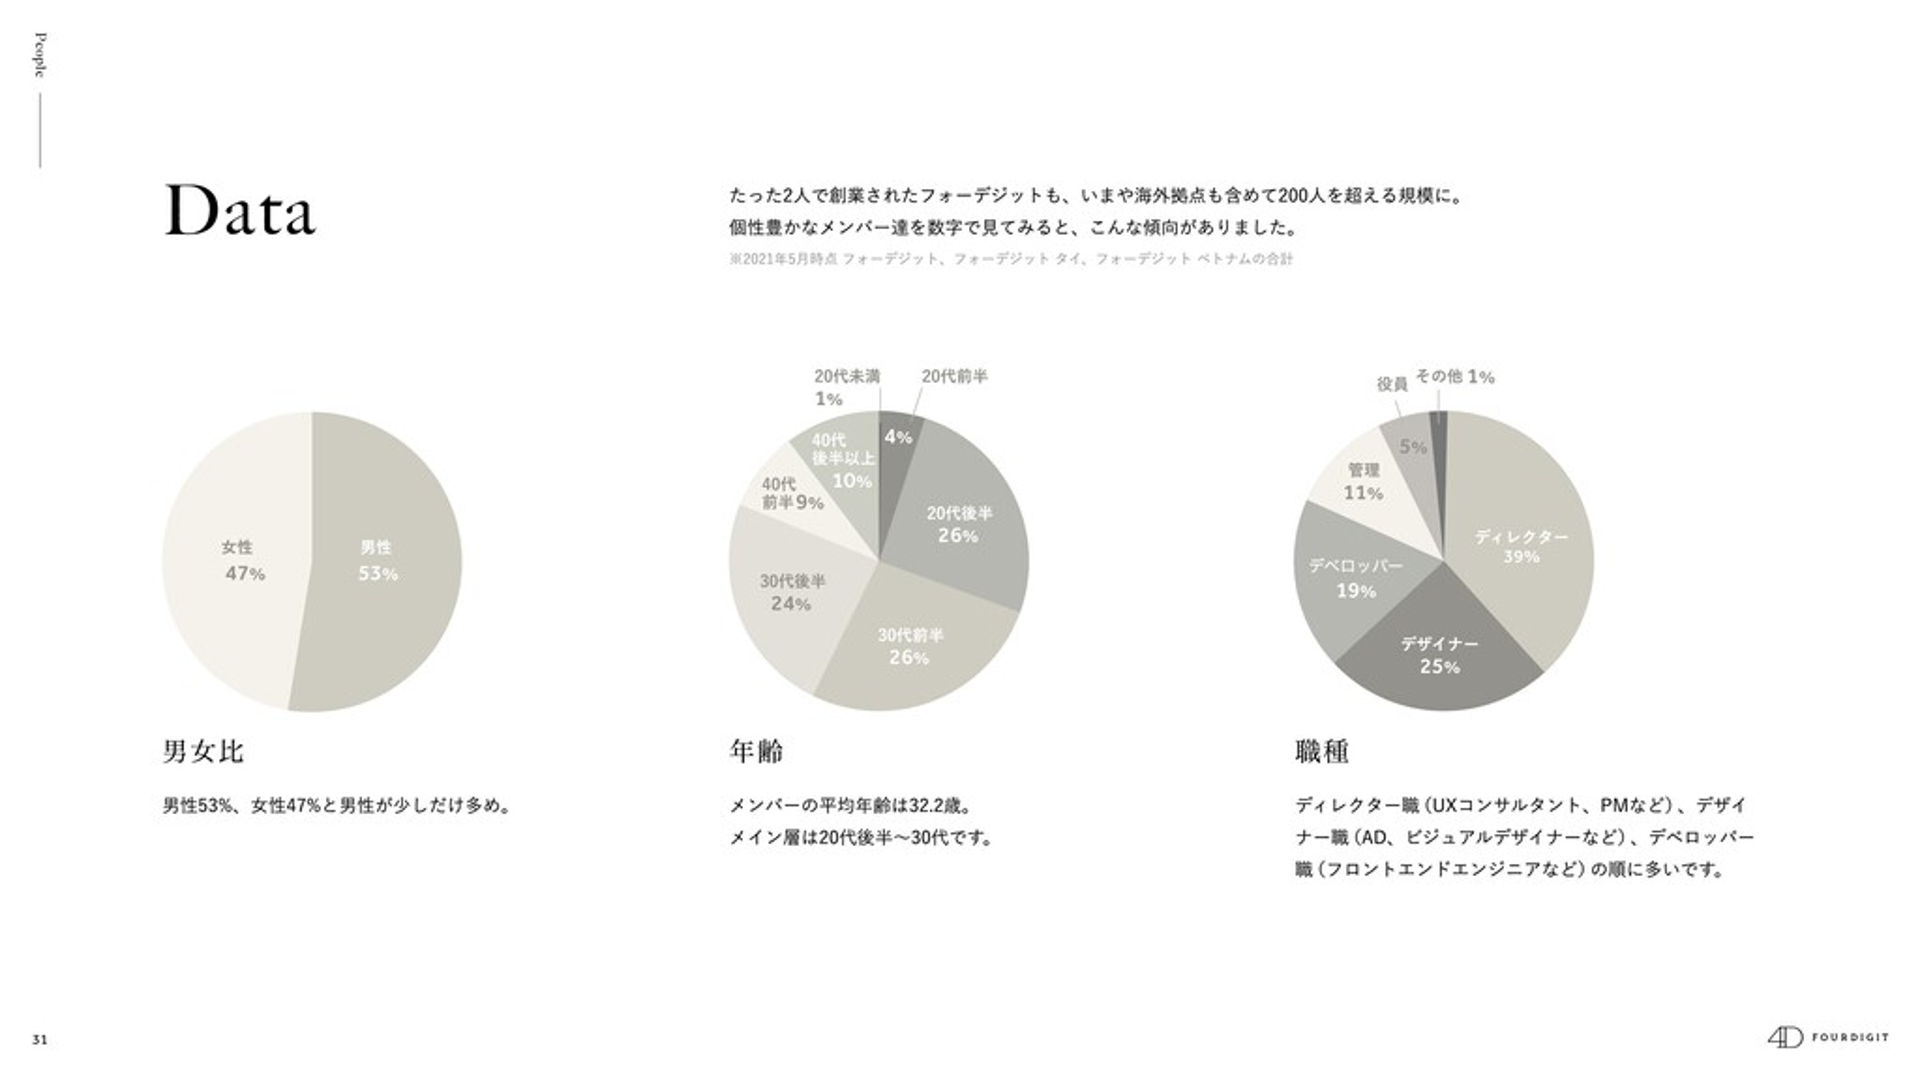 31 11% 25% 39% 19% 5% 1% 10% 4% 24% 9% 26% 26% ...